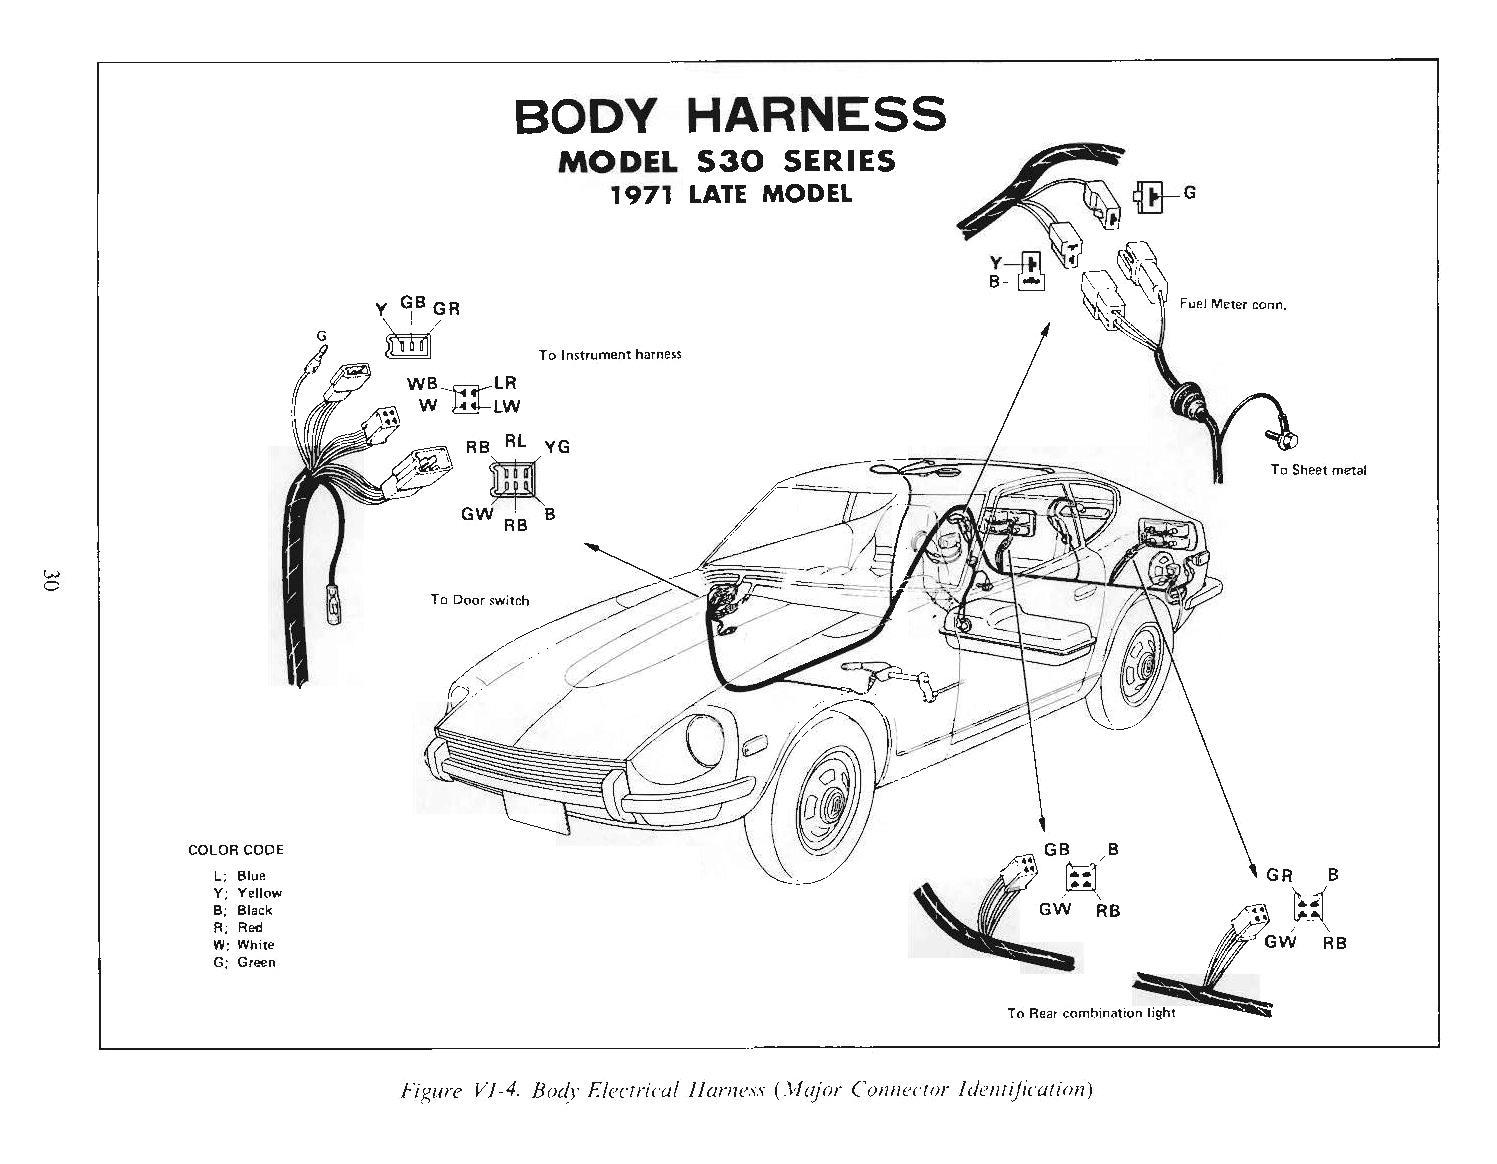 1971 datsun 510 wiring diagram mitsubishi triton radio 1972 240z library